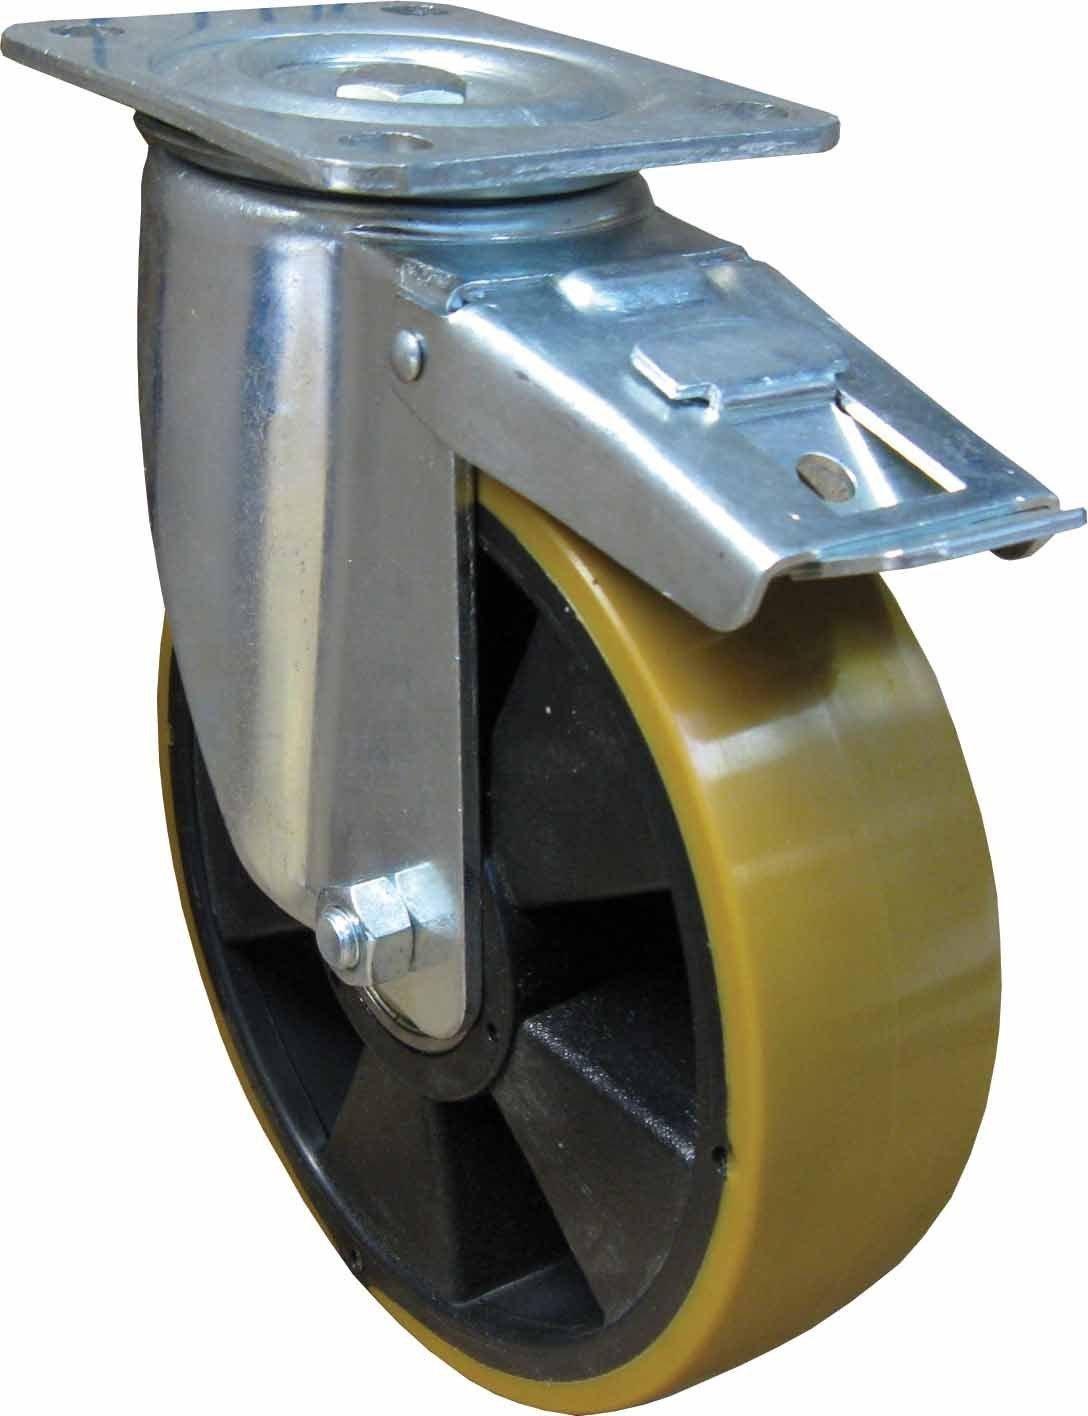 Schwerlast Polyurethan Lenkrolle mit Feststeller Rad /ø 200mm mit Tragkraft 1000Kg Lenkrolle Transportrolle Schwerlastrolle PU Artikel W941//F//3//200//S97//P6//TK1000